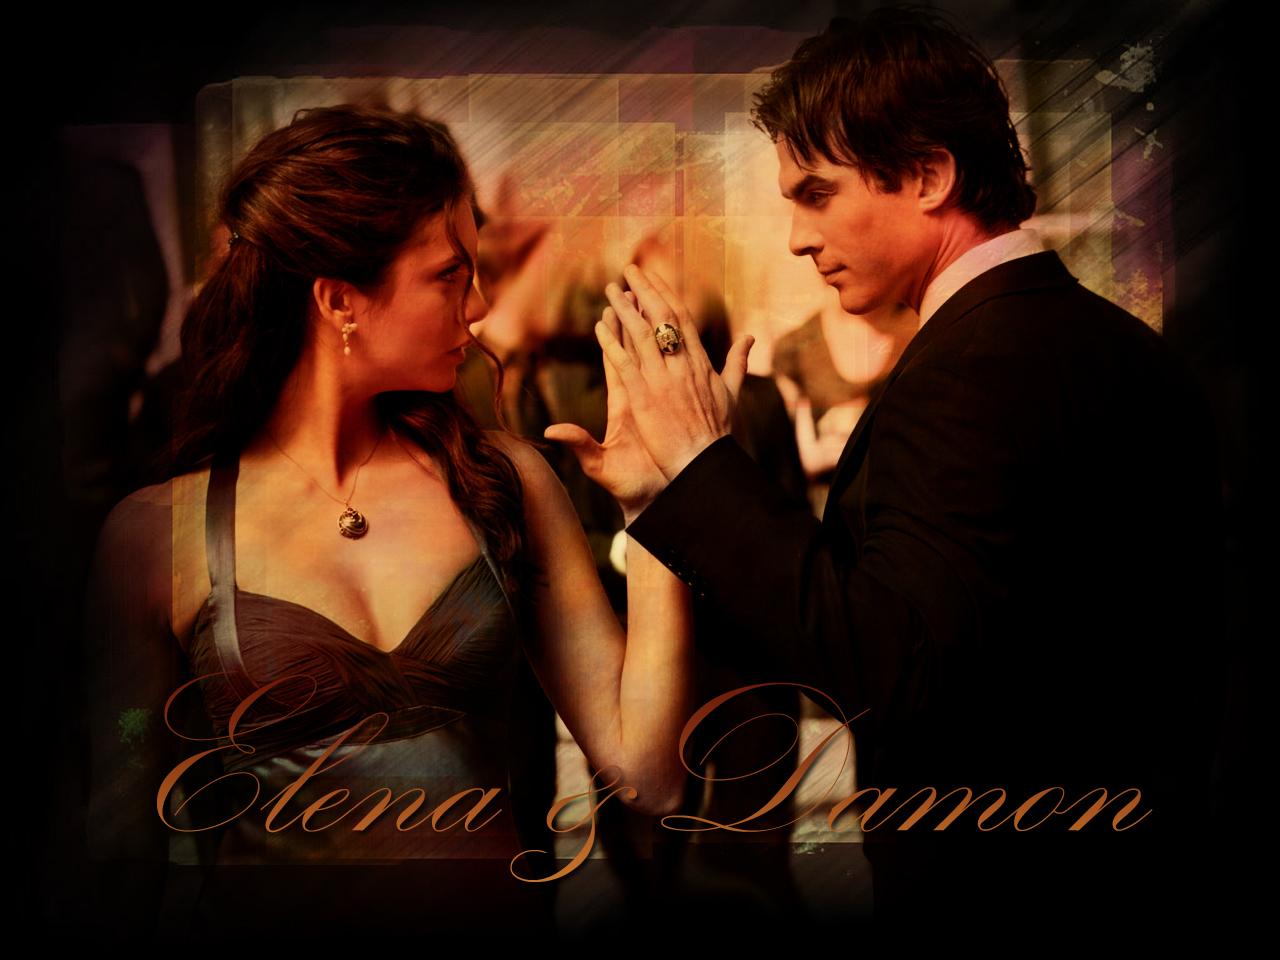 Vampire Diaries Love Forever - Damon And Elena Ball - HD Wallpaper